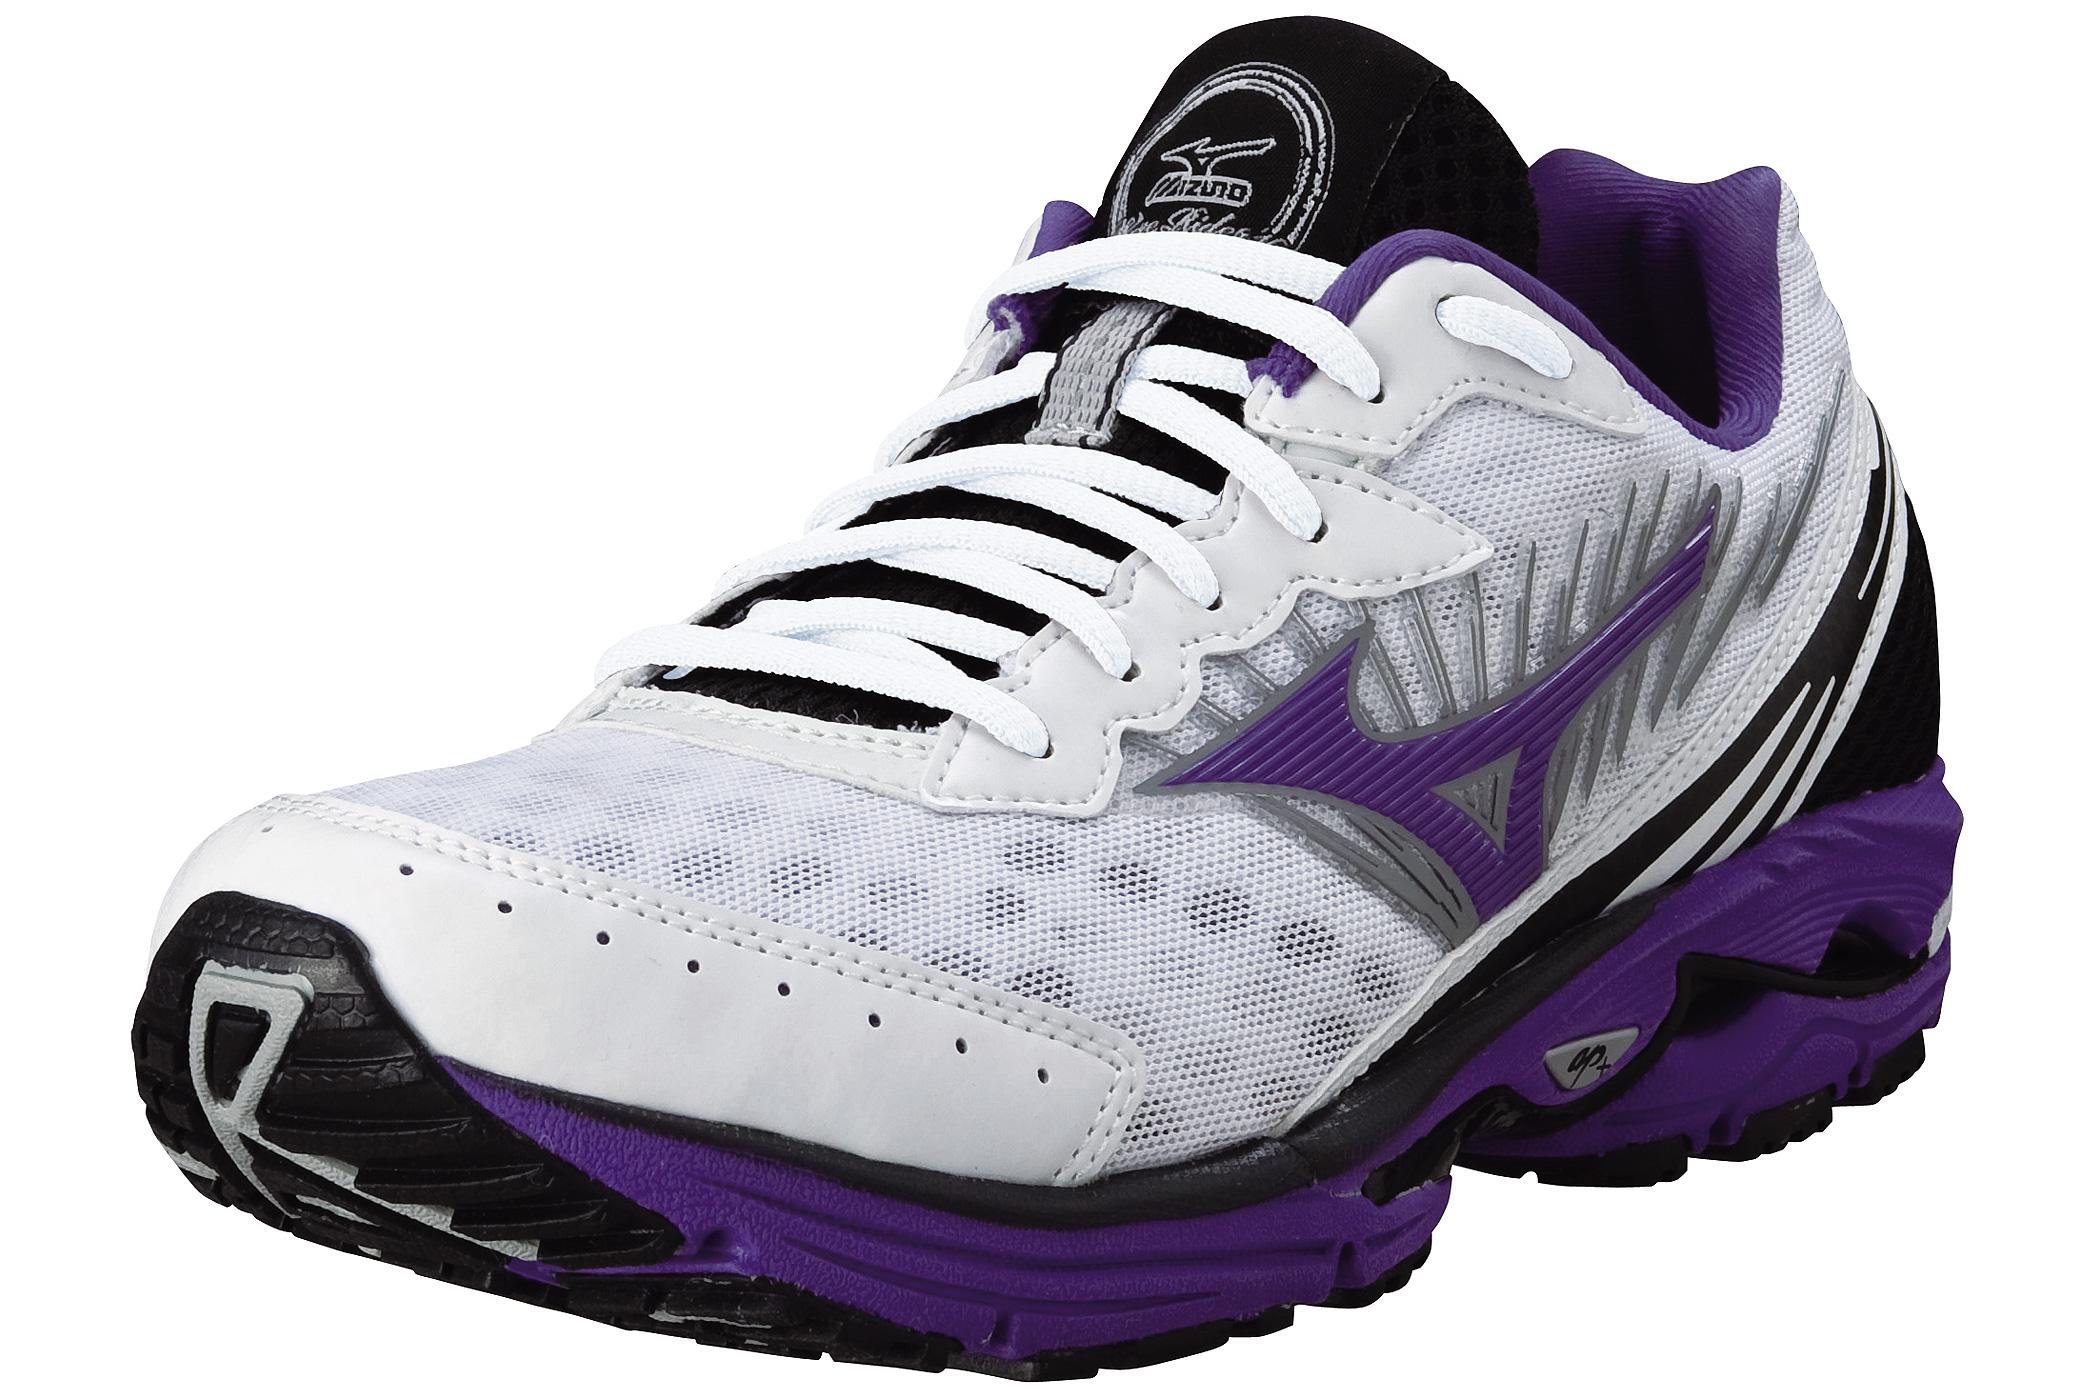 mizuno rider 16 chaussures sport femme wave blanc 2013 38. Black Bedroom Furniture Sets. Home Design Ideas